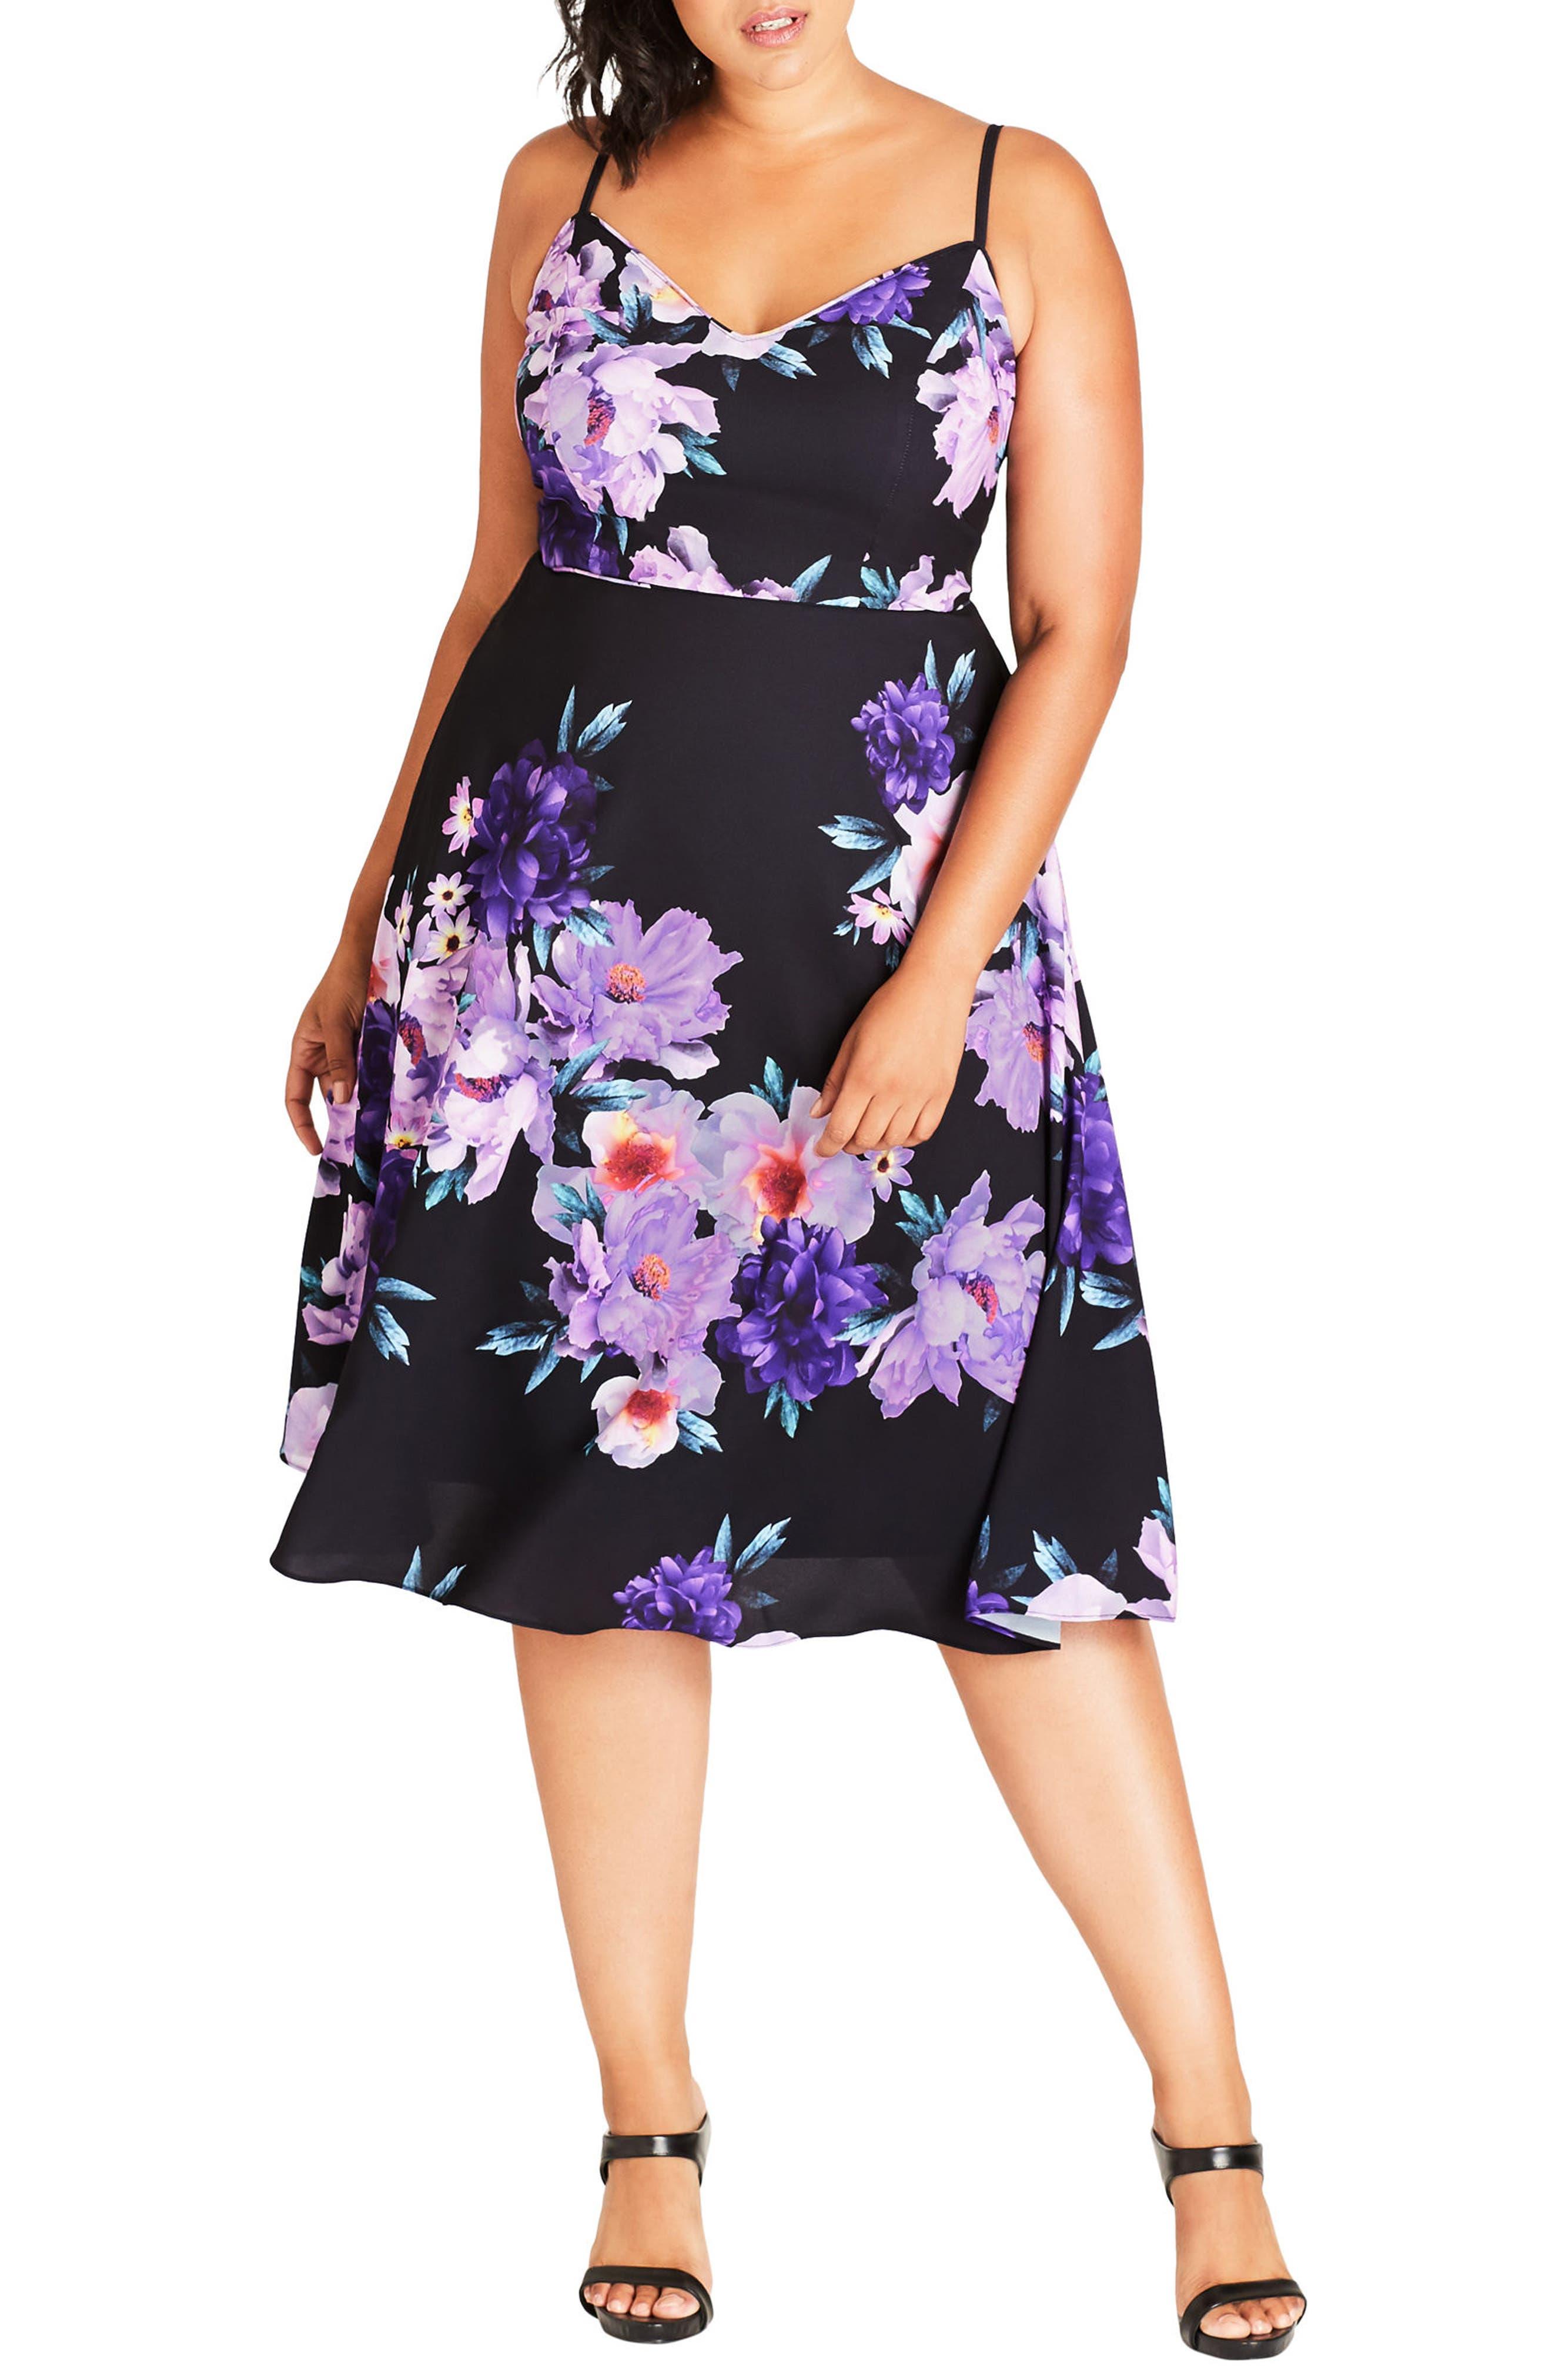 City Chic Summer Fling Floral Print Midi Dress (Plus Size)